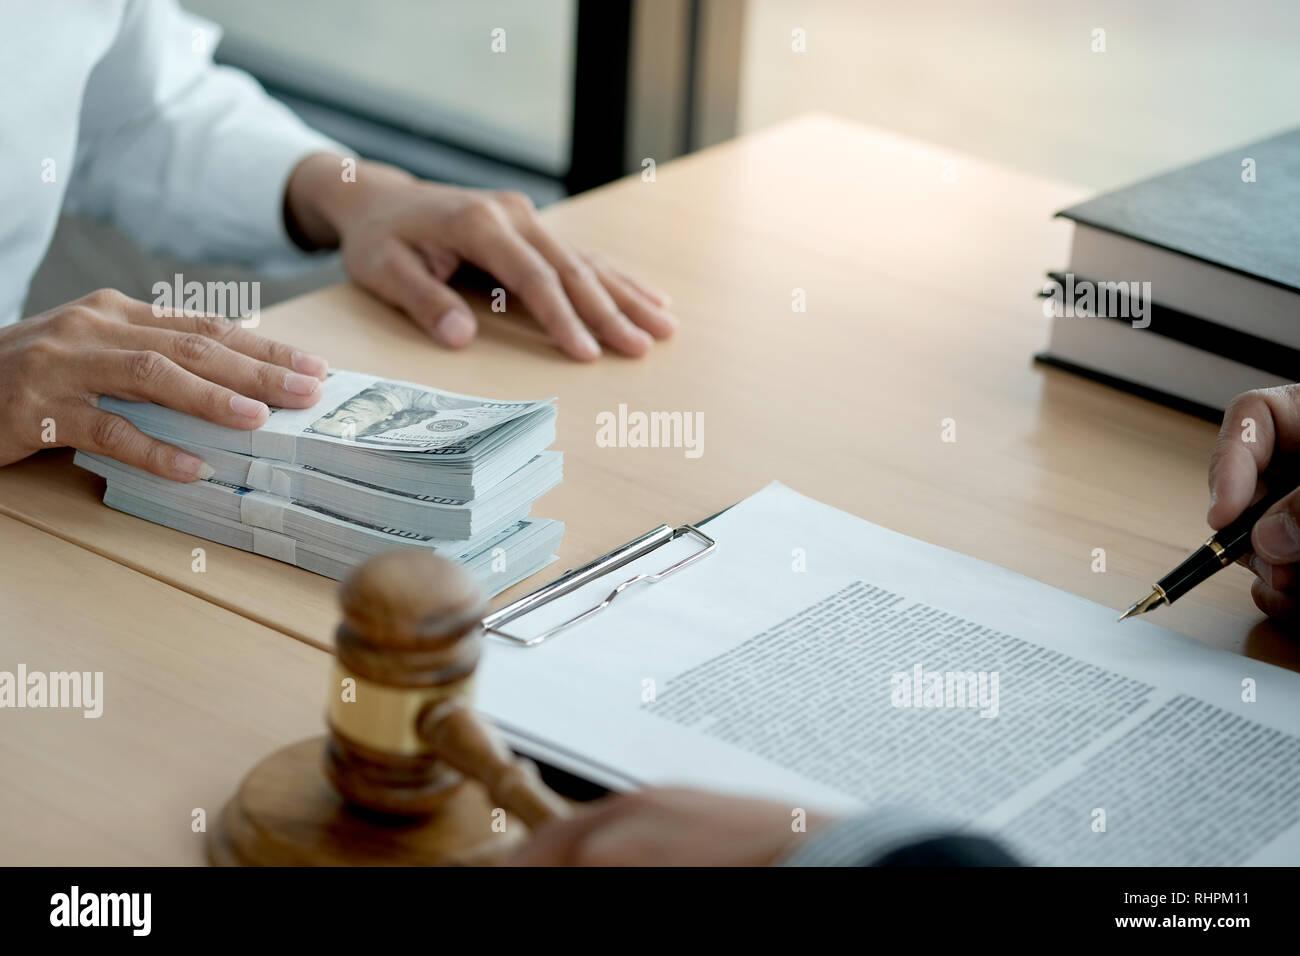 Down Judge Stock Photos & Down Judge Stock Images - Alamy